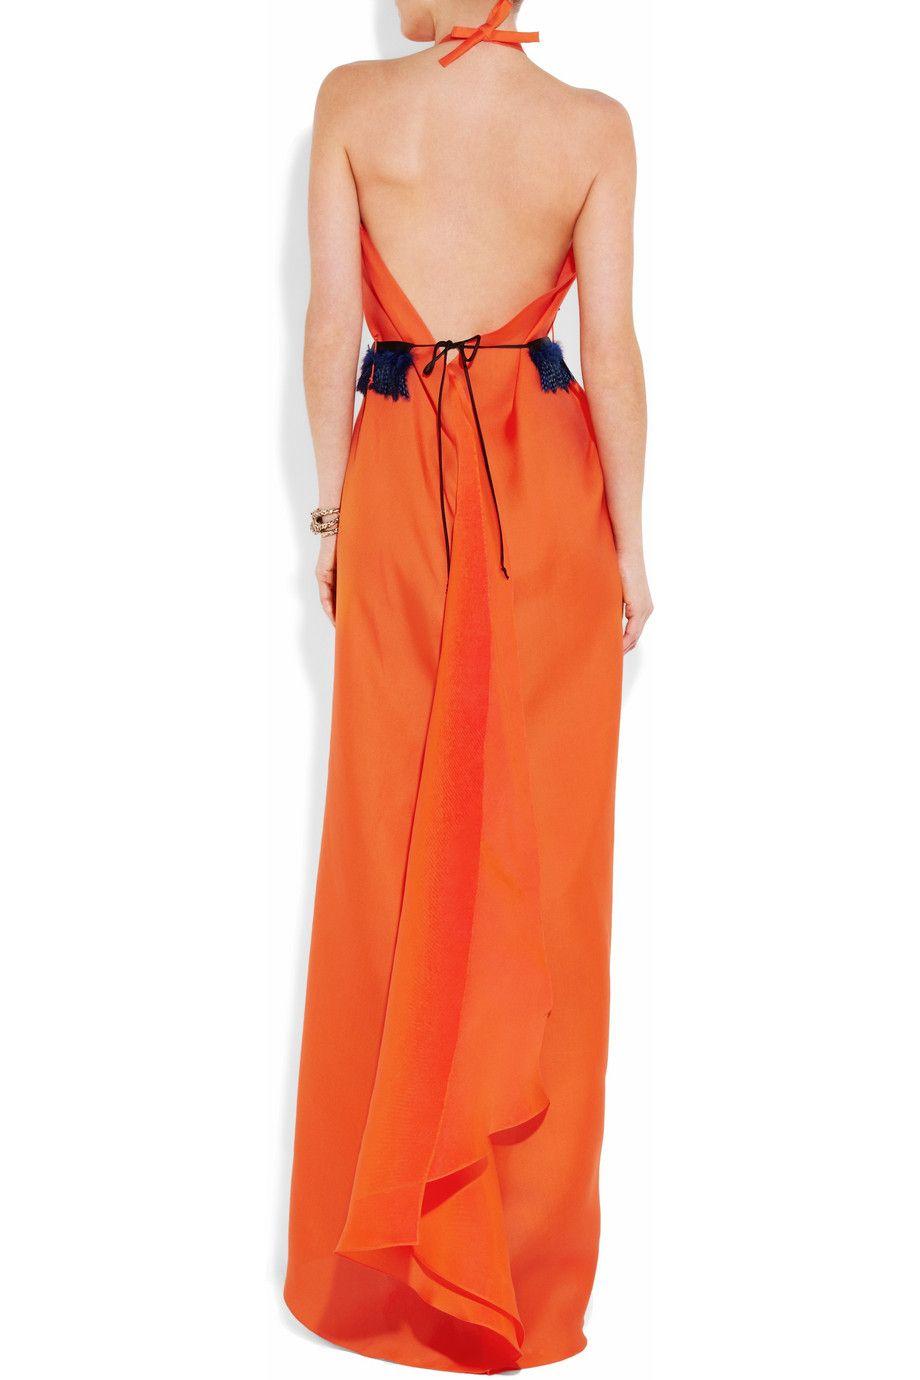 Roksanda ilincic condor ruffled silk organza gown style beauty